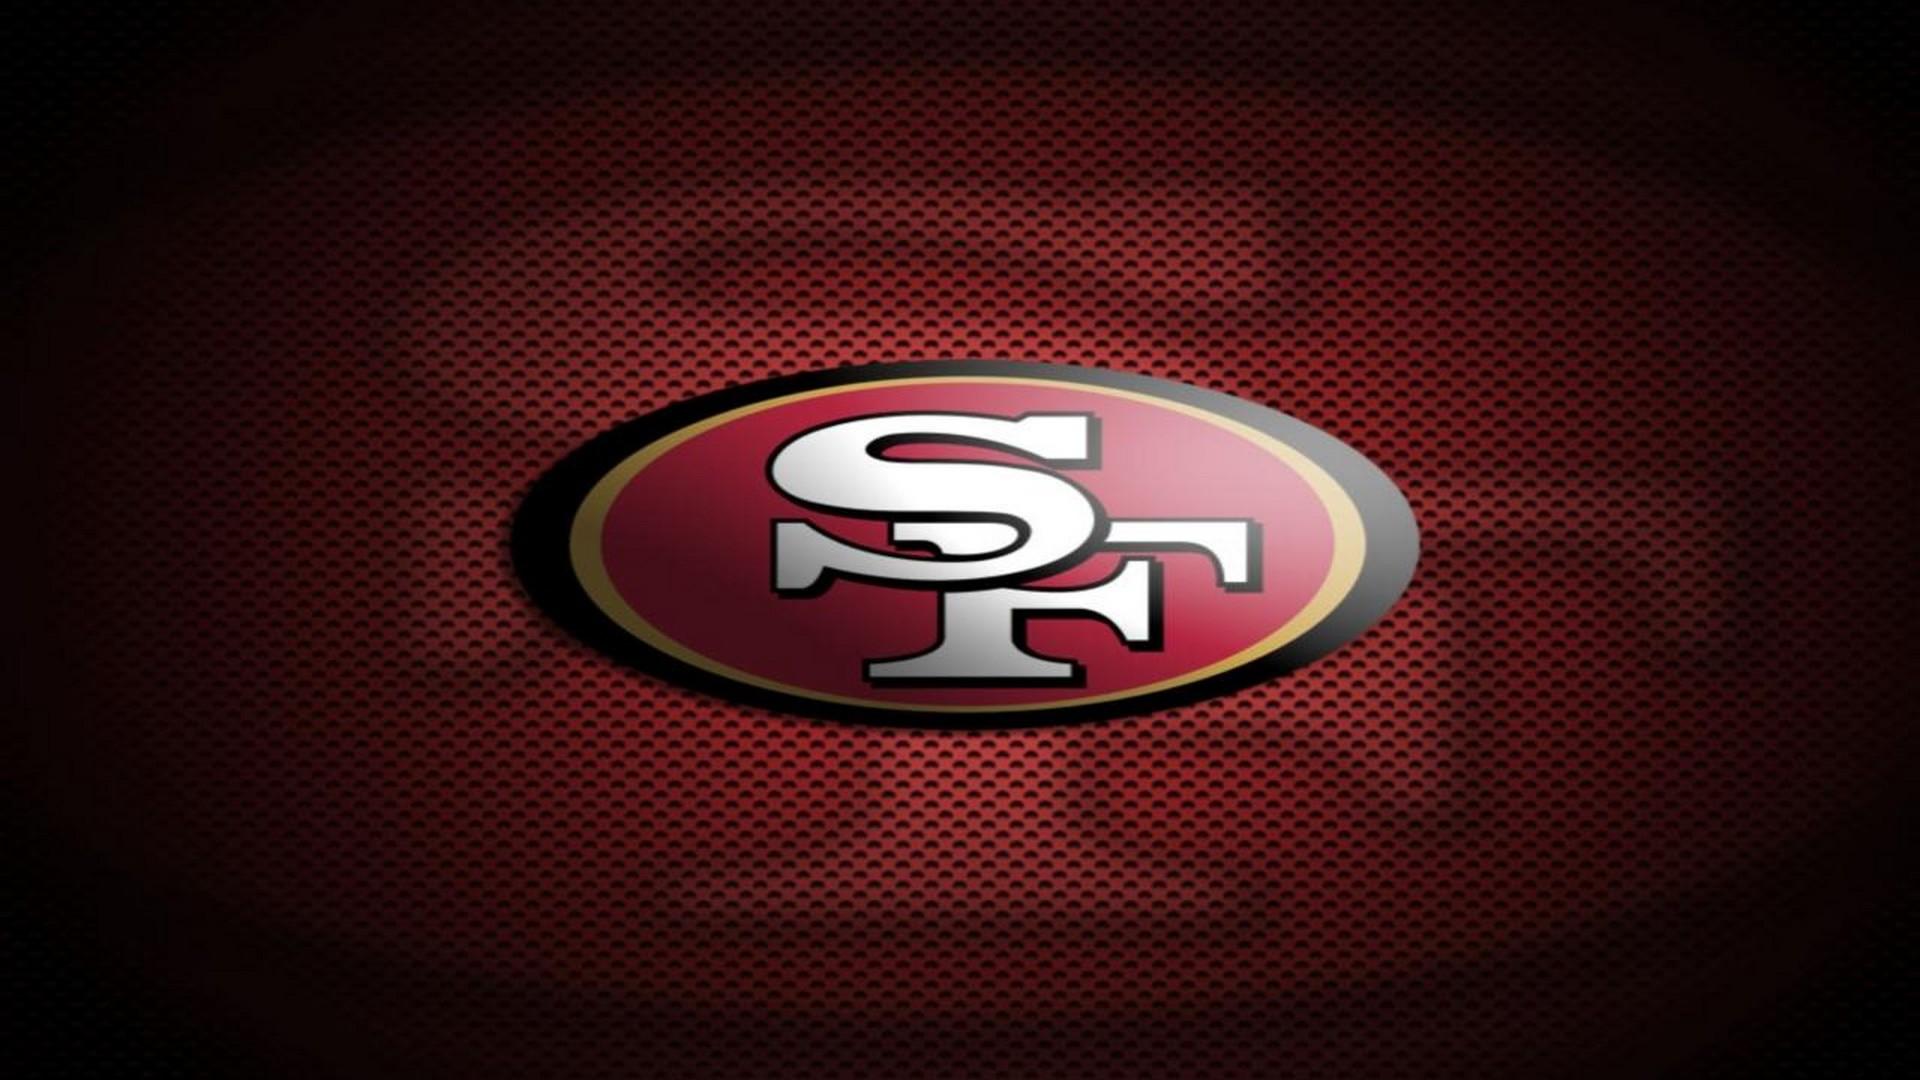 Sf Giants Iphone Wallpaper San Francisco 49ers Desktop Wallpapers 2020 Nfl Football